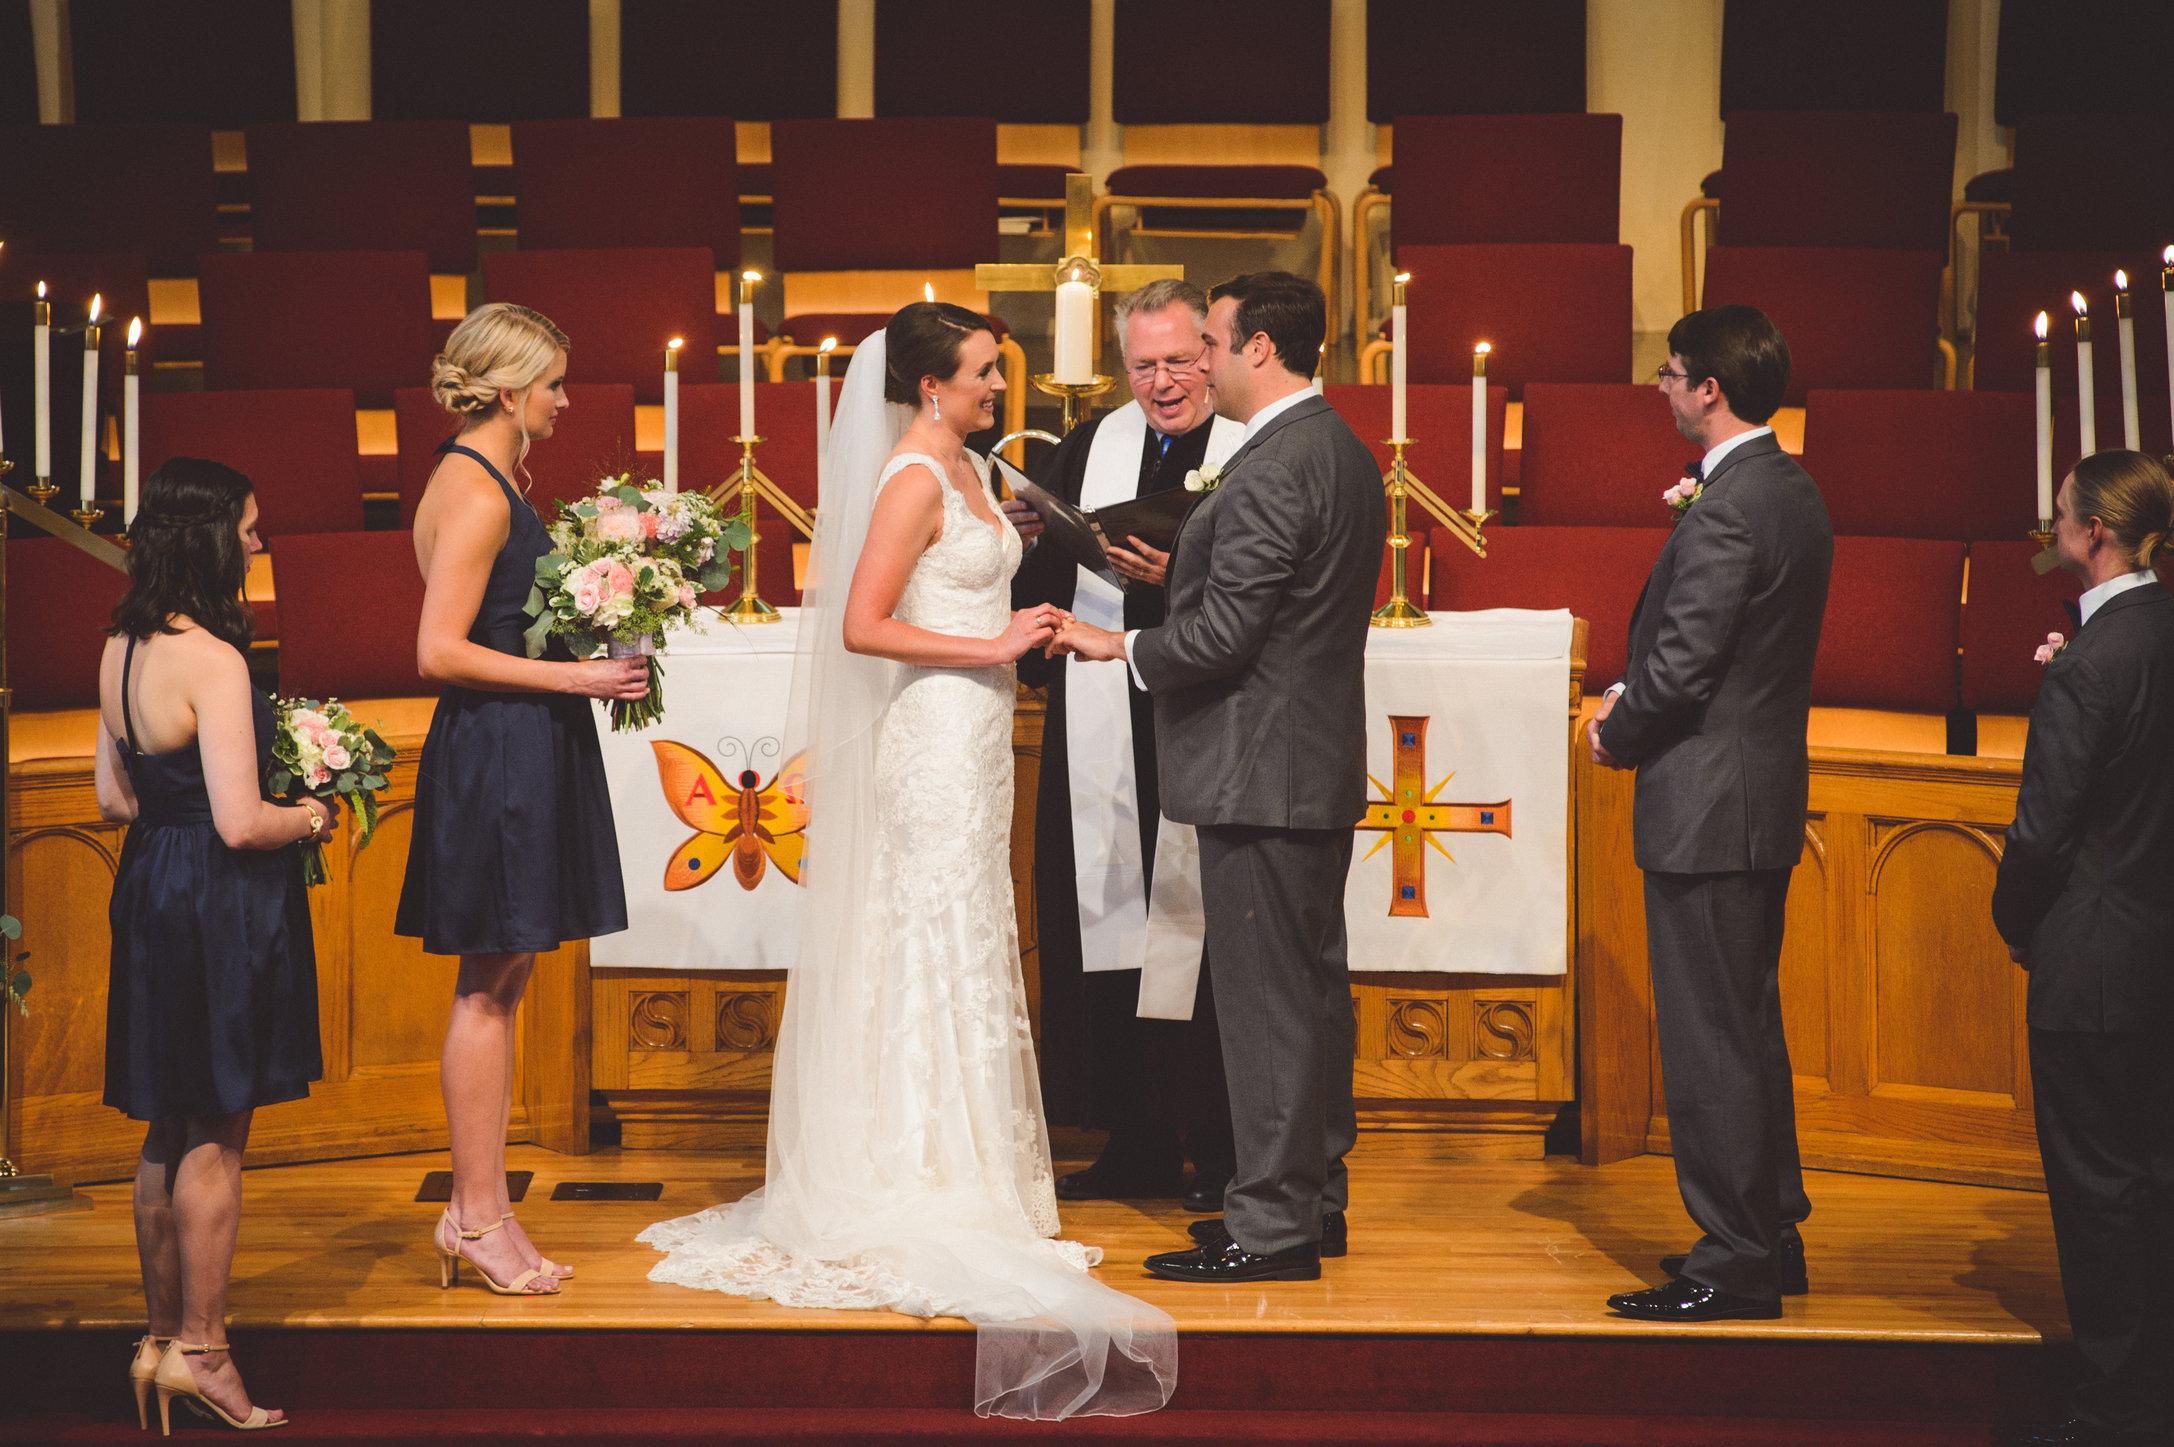 SandC-wedding-215.jpg